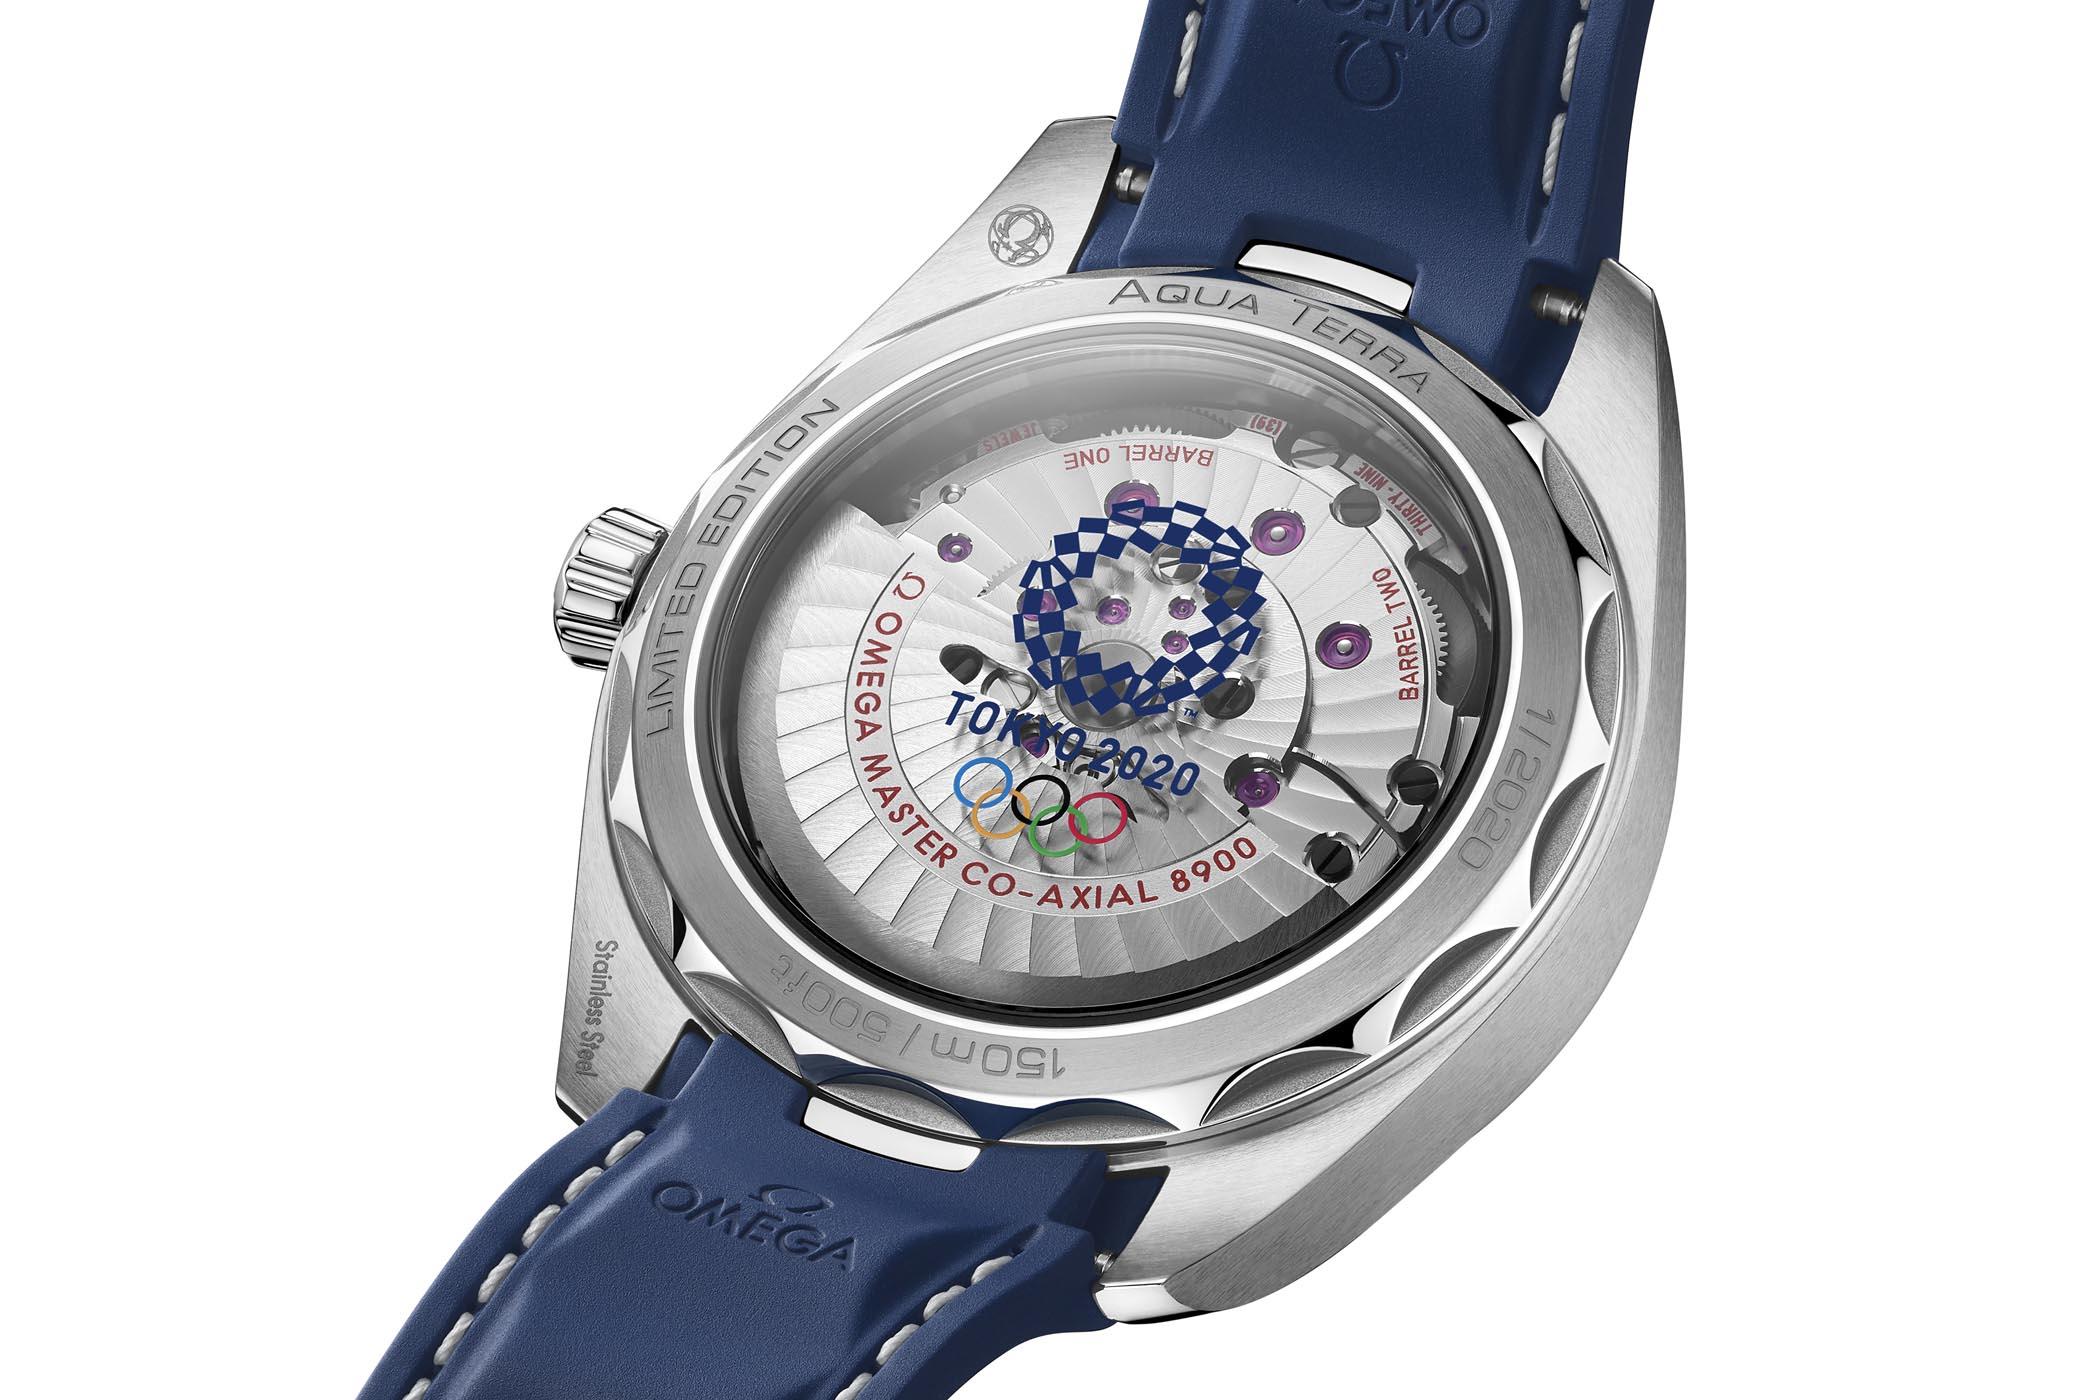 Omega Seamaster Aqua Terra 150m Tokyo 2020 Countdown 522.12.41.21.03.001